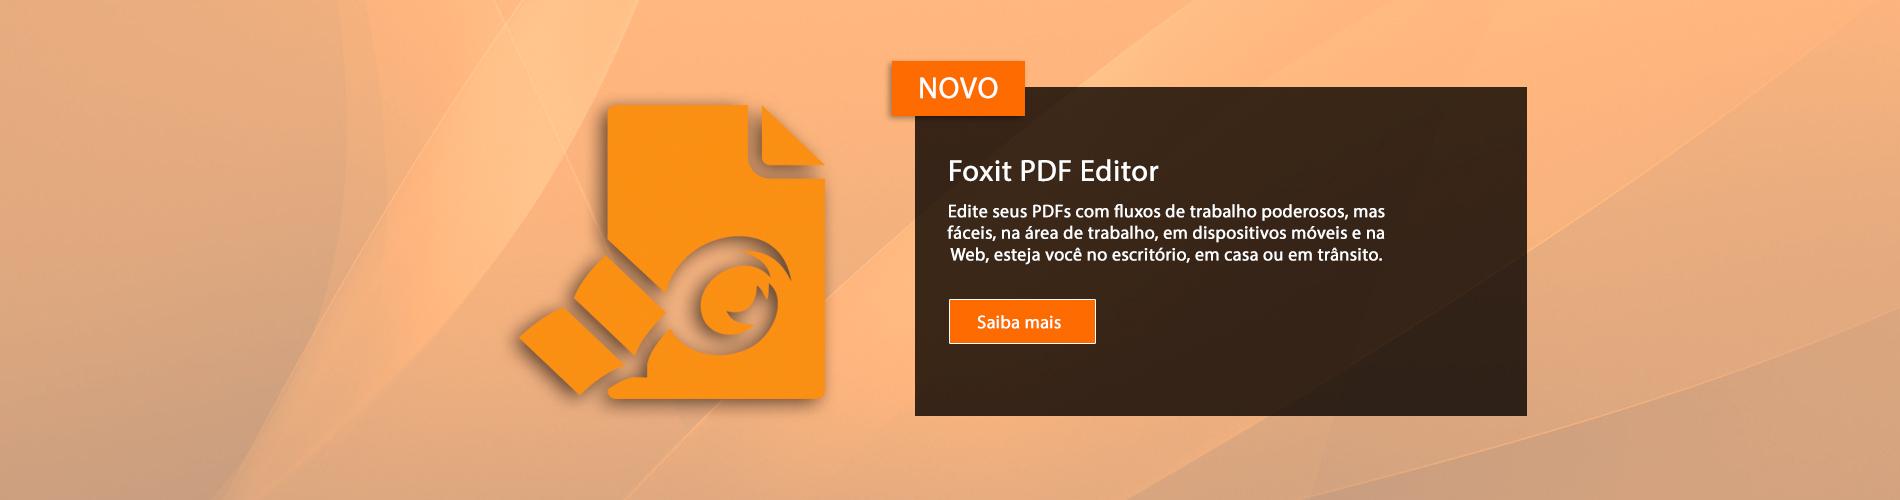 slide_webinar_foxitpdfeditor